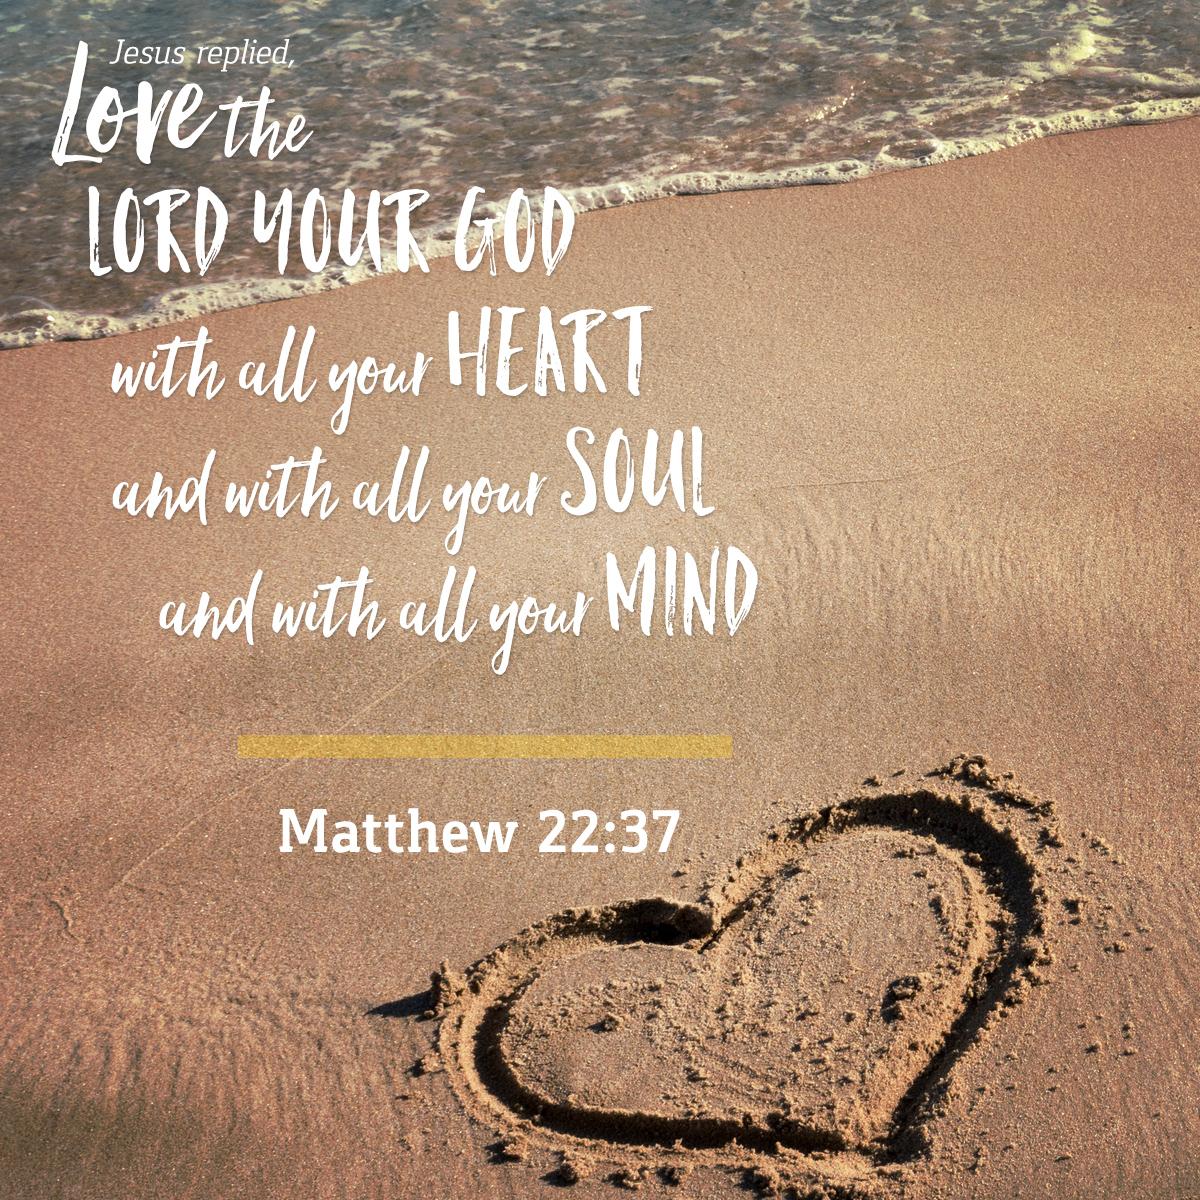 Matthew 22:37 - Daily Verse